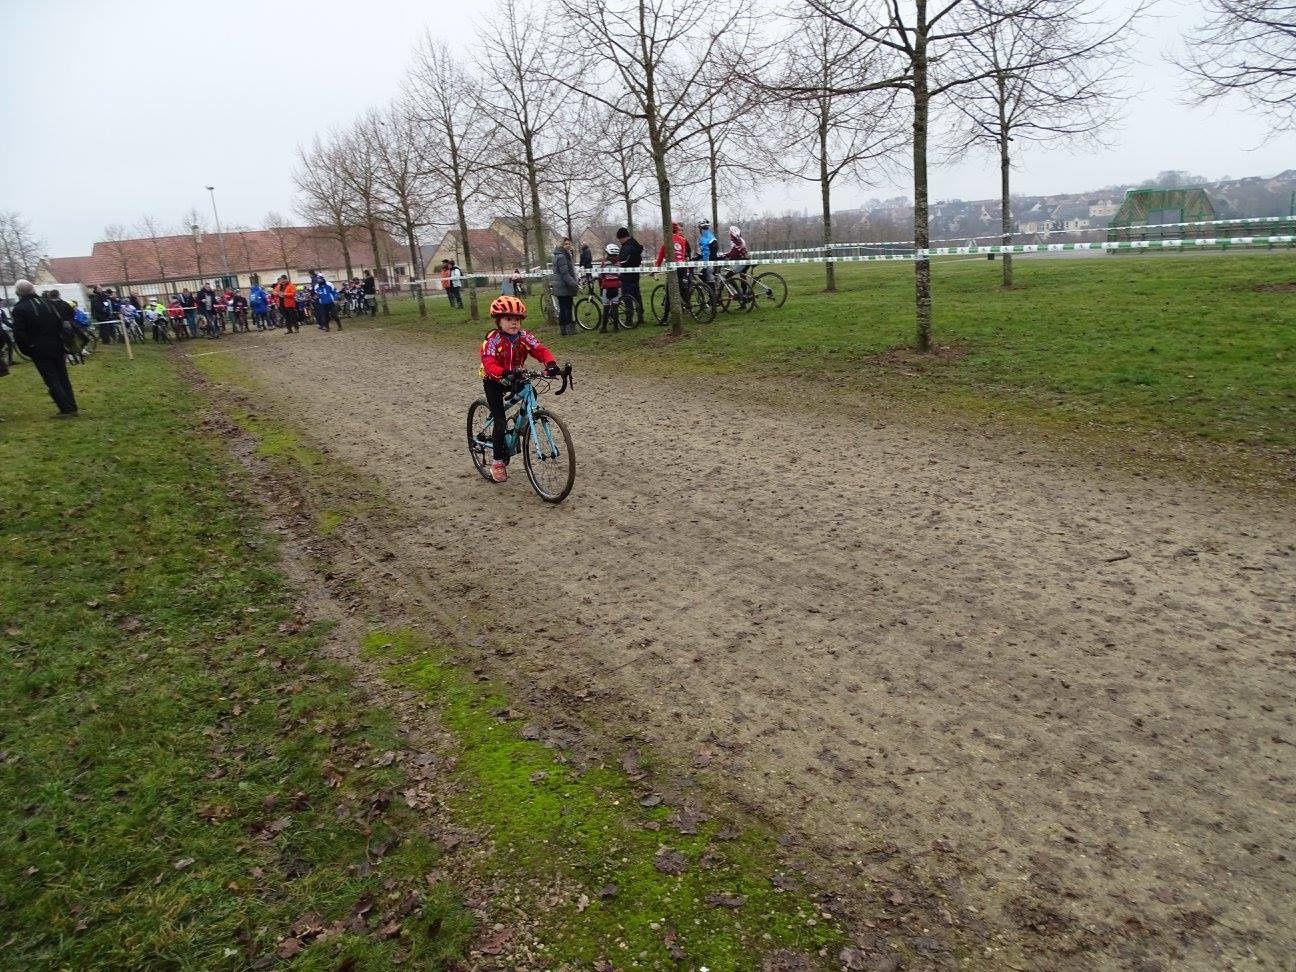 Album photos du cyclo-cross du Coudray (28)